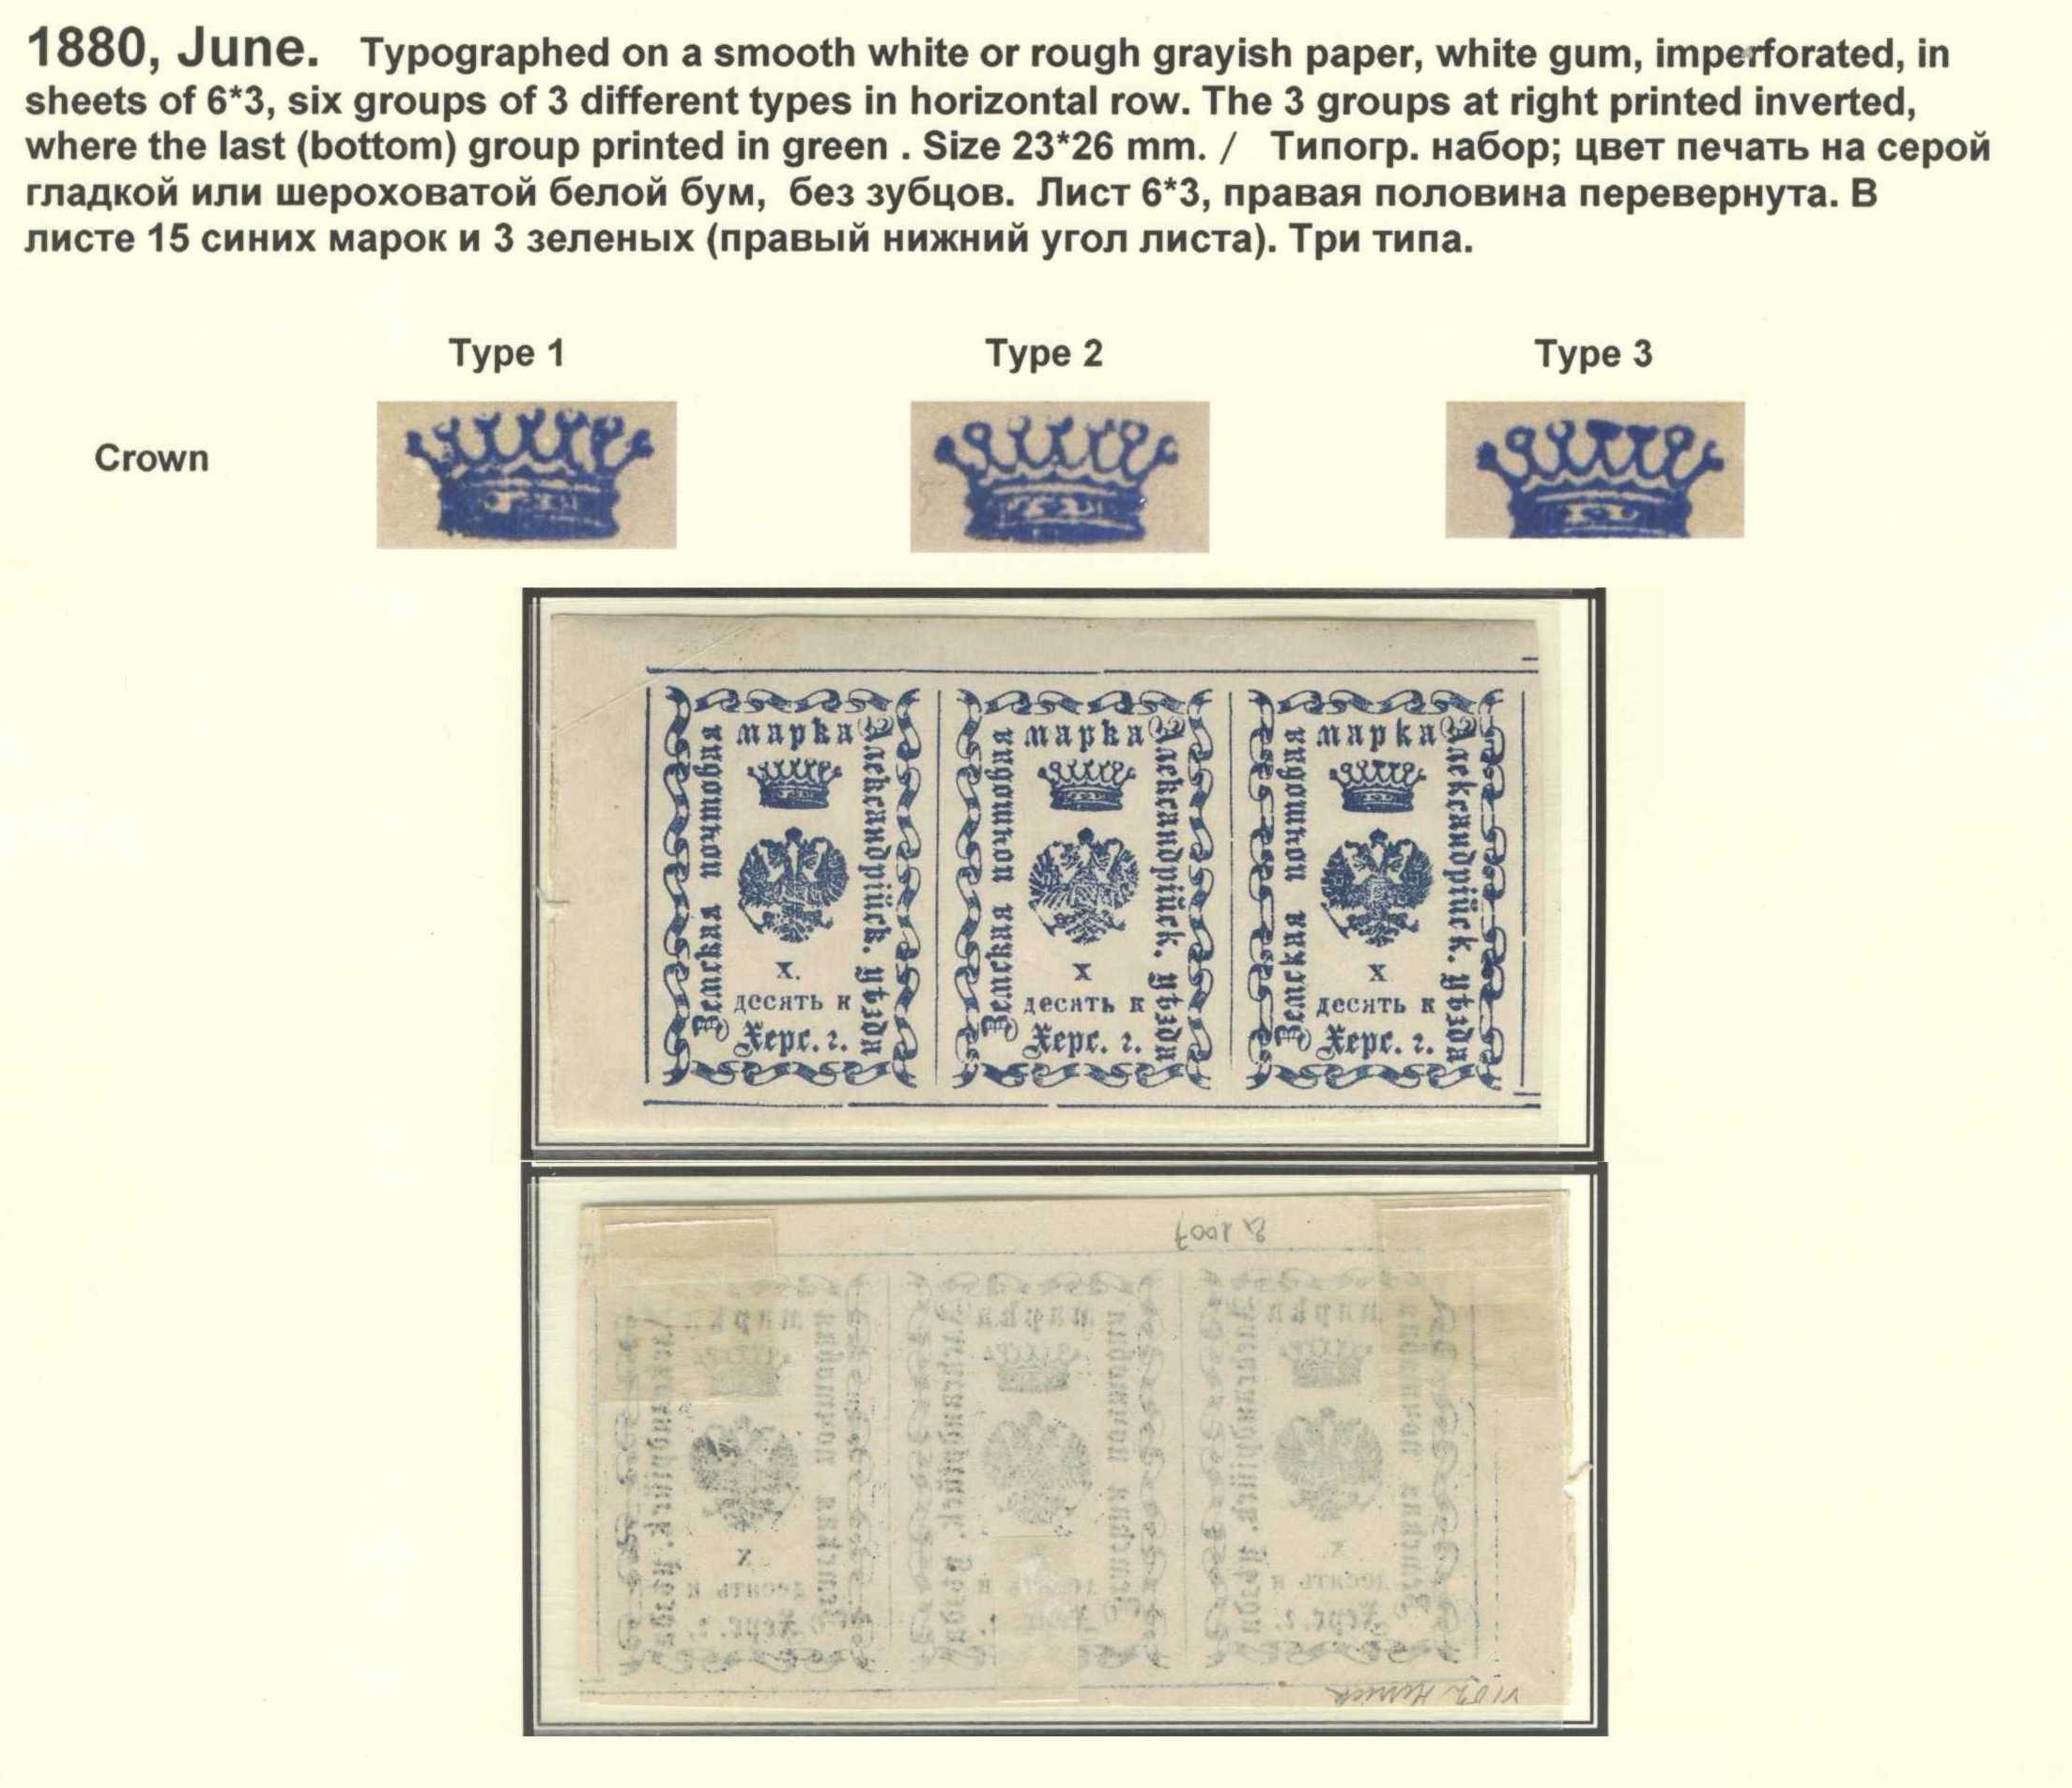 Александрия 1880. Трансфер блок с типами 1-3